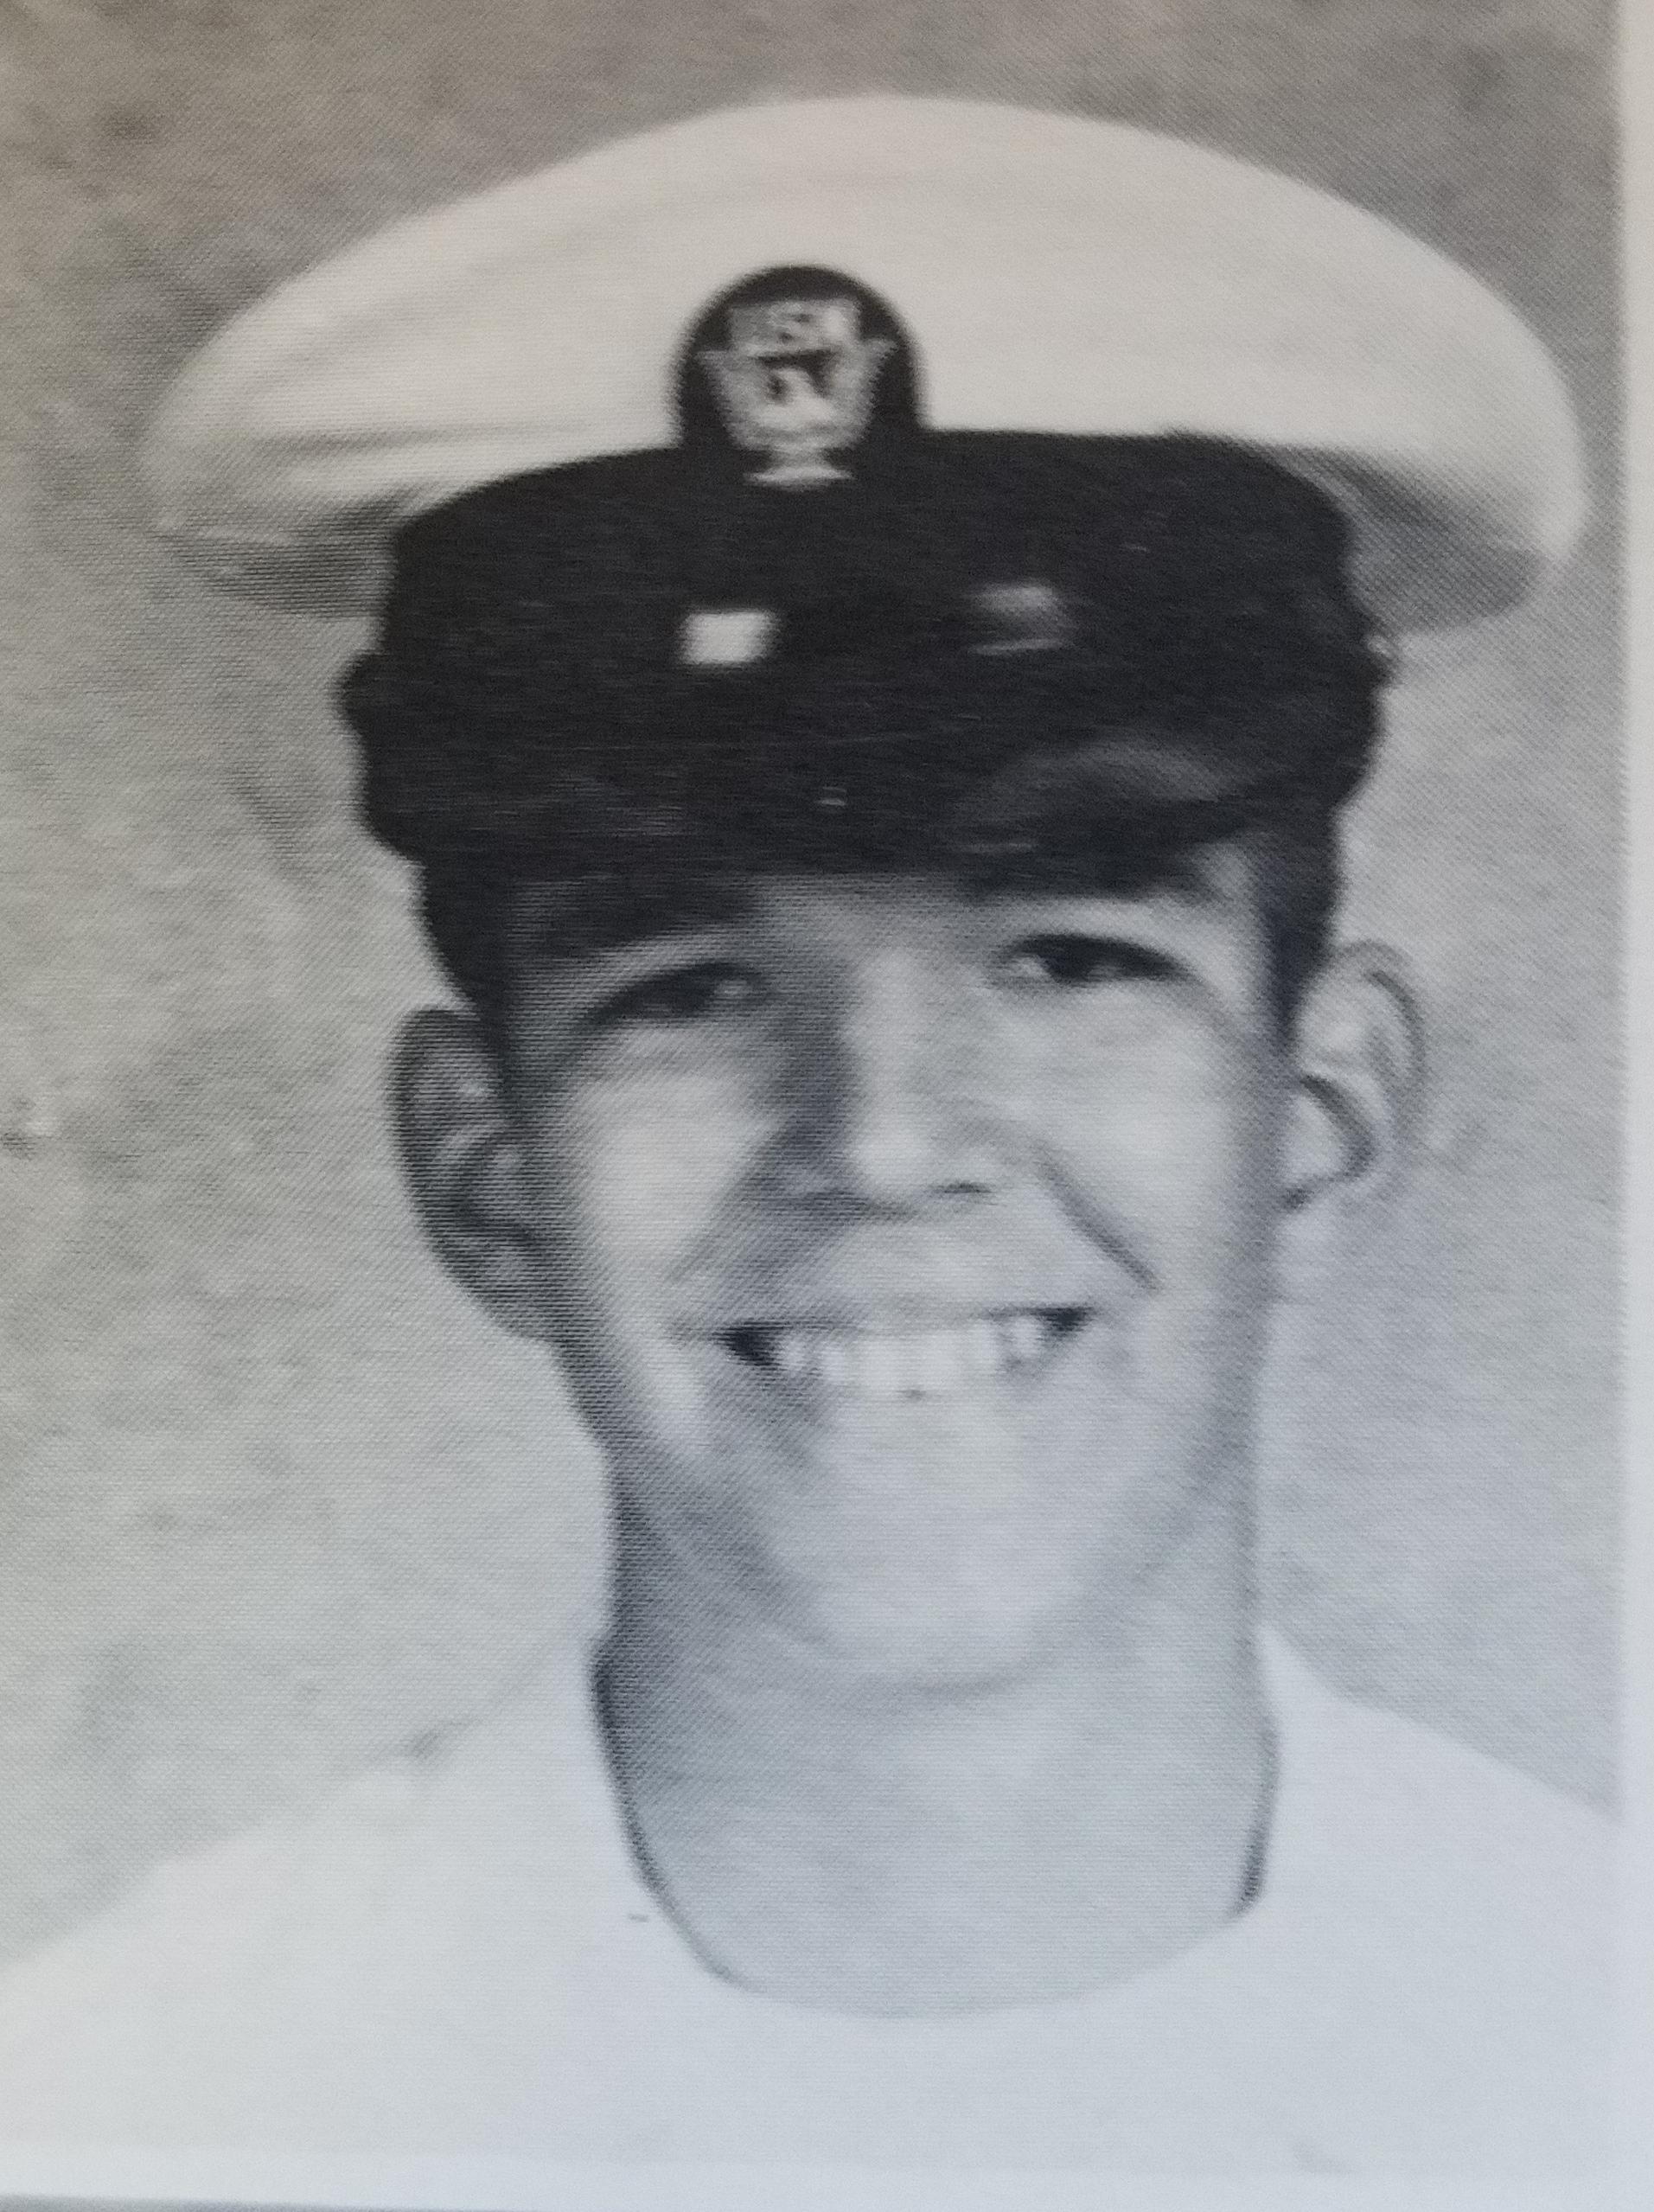 Navy, San Diego, RTC, recruit